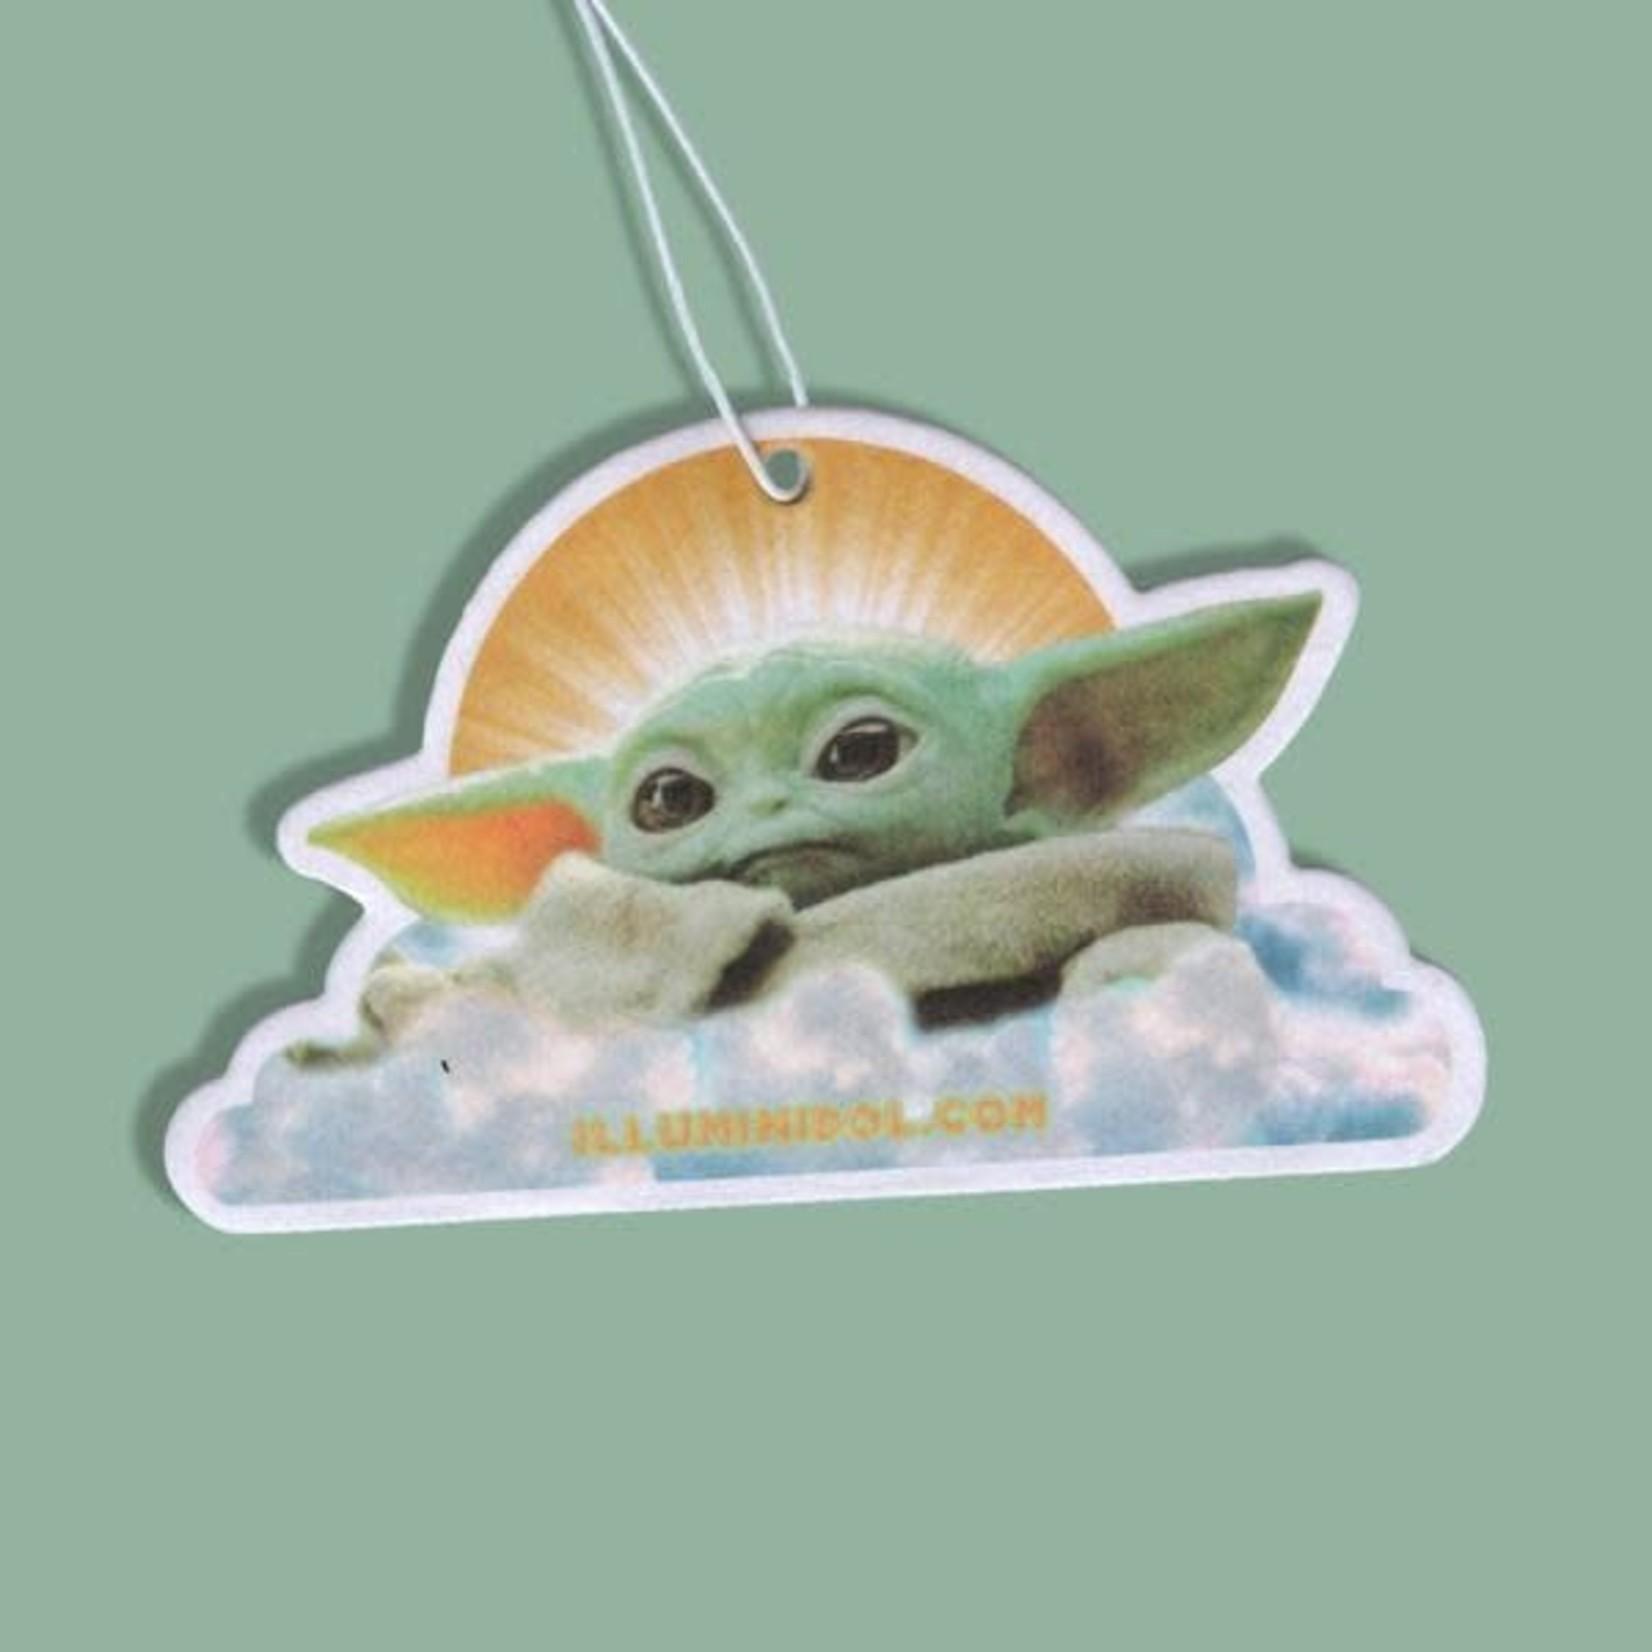 Air Freshener - Baby Yoda